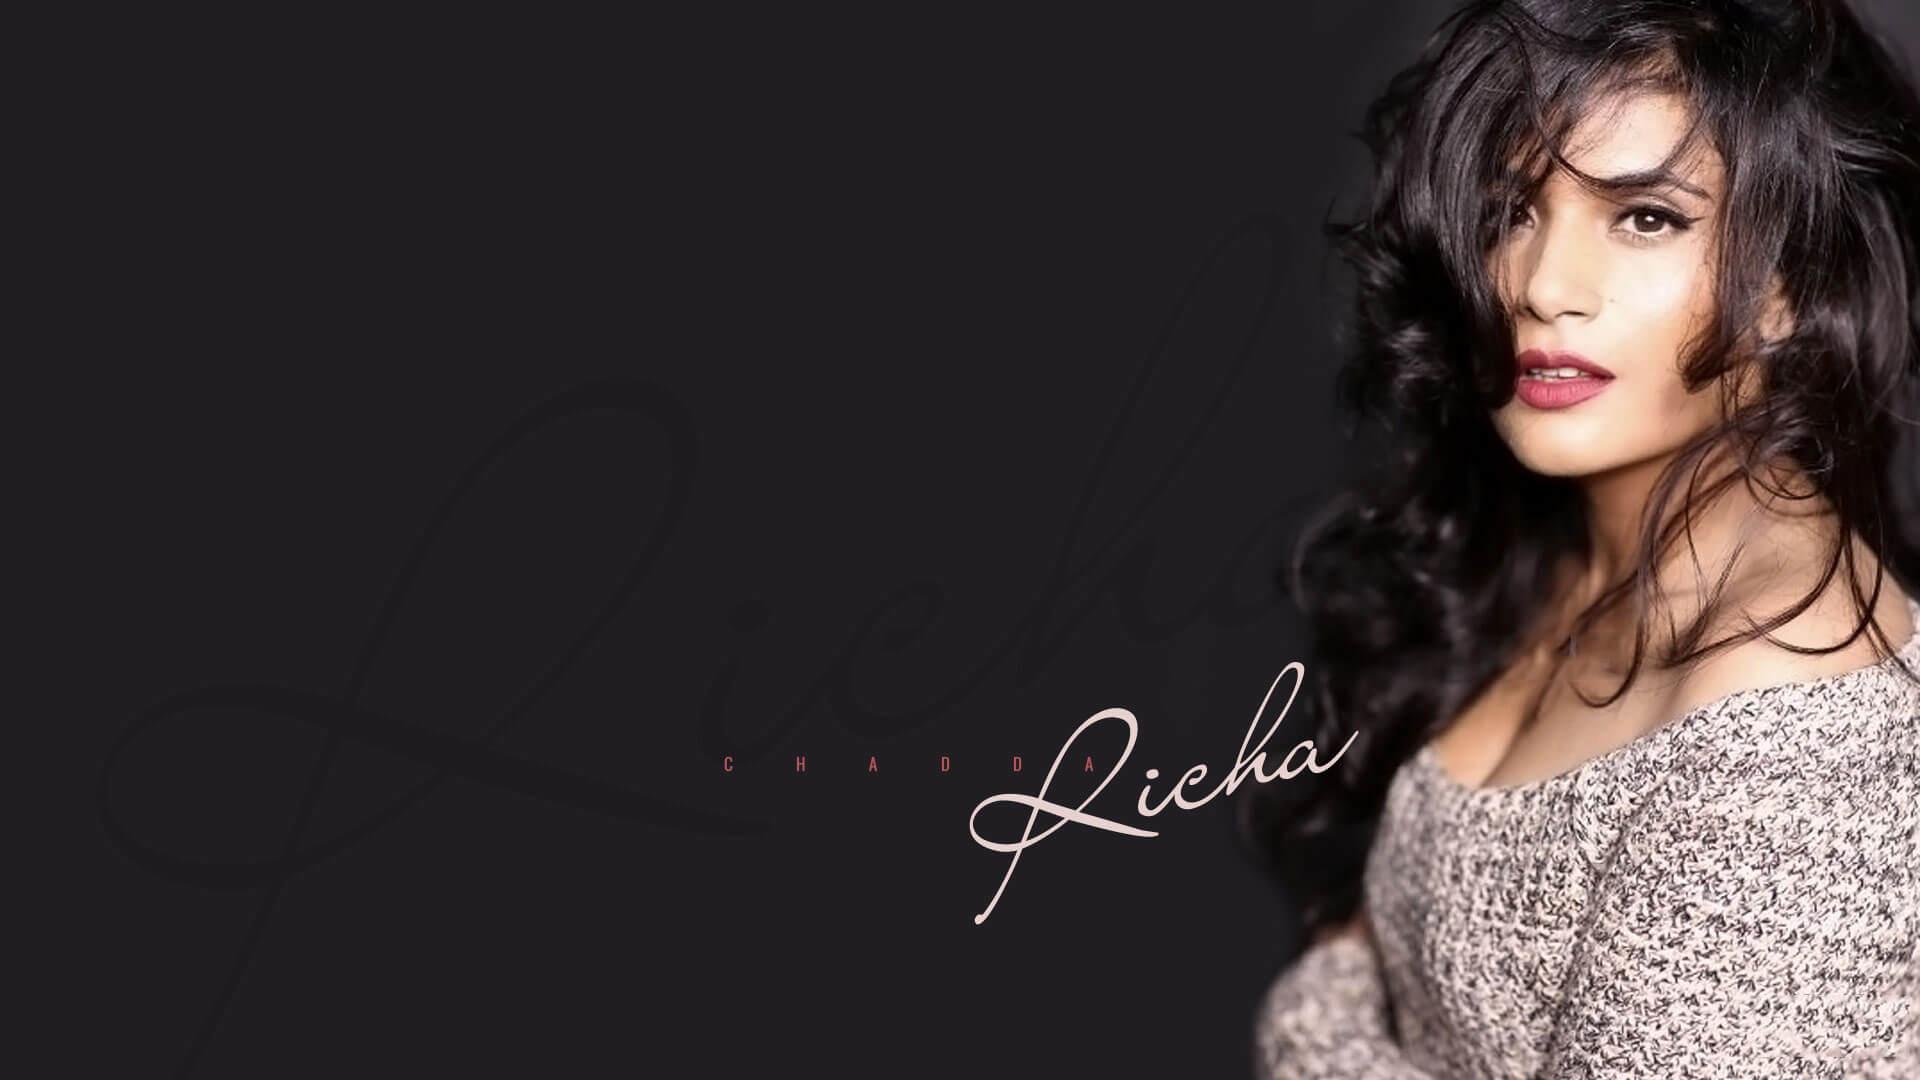 Richa Chadda Boyfriend, Images(photos), Biography, Movies, Marriage, Date Of Birth, News, Age, Height, Net Worth, Education, Awards, Instagram, Facebook, Wiki, Twitter, Imdb (58)